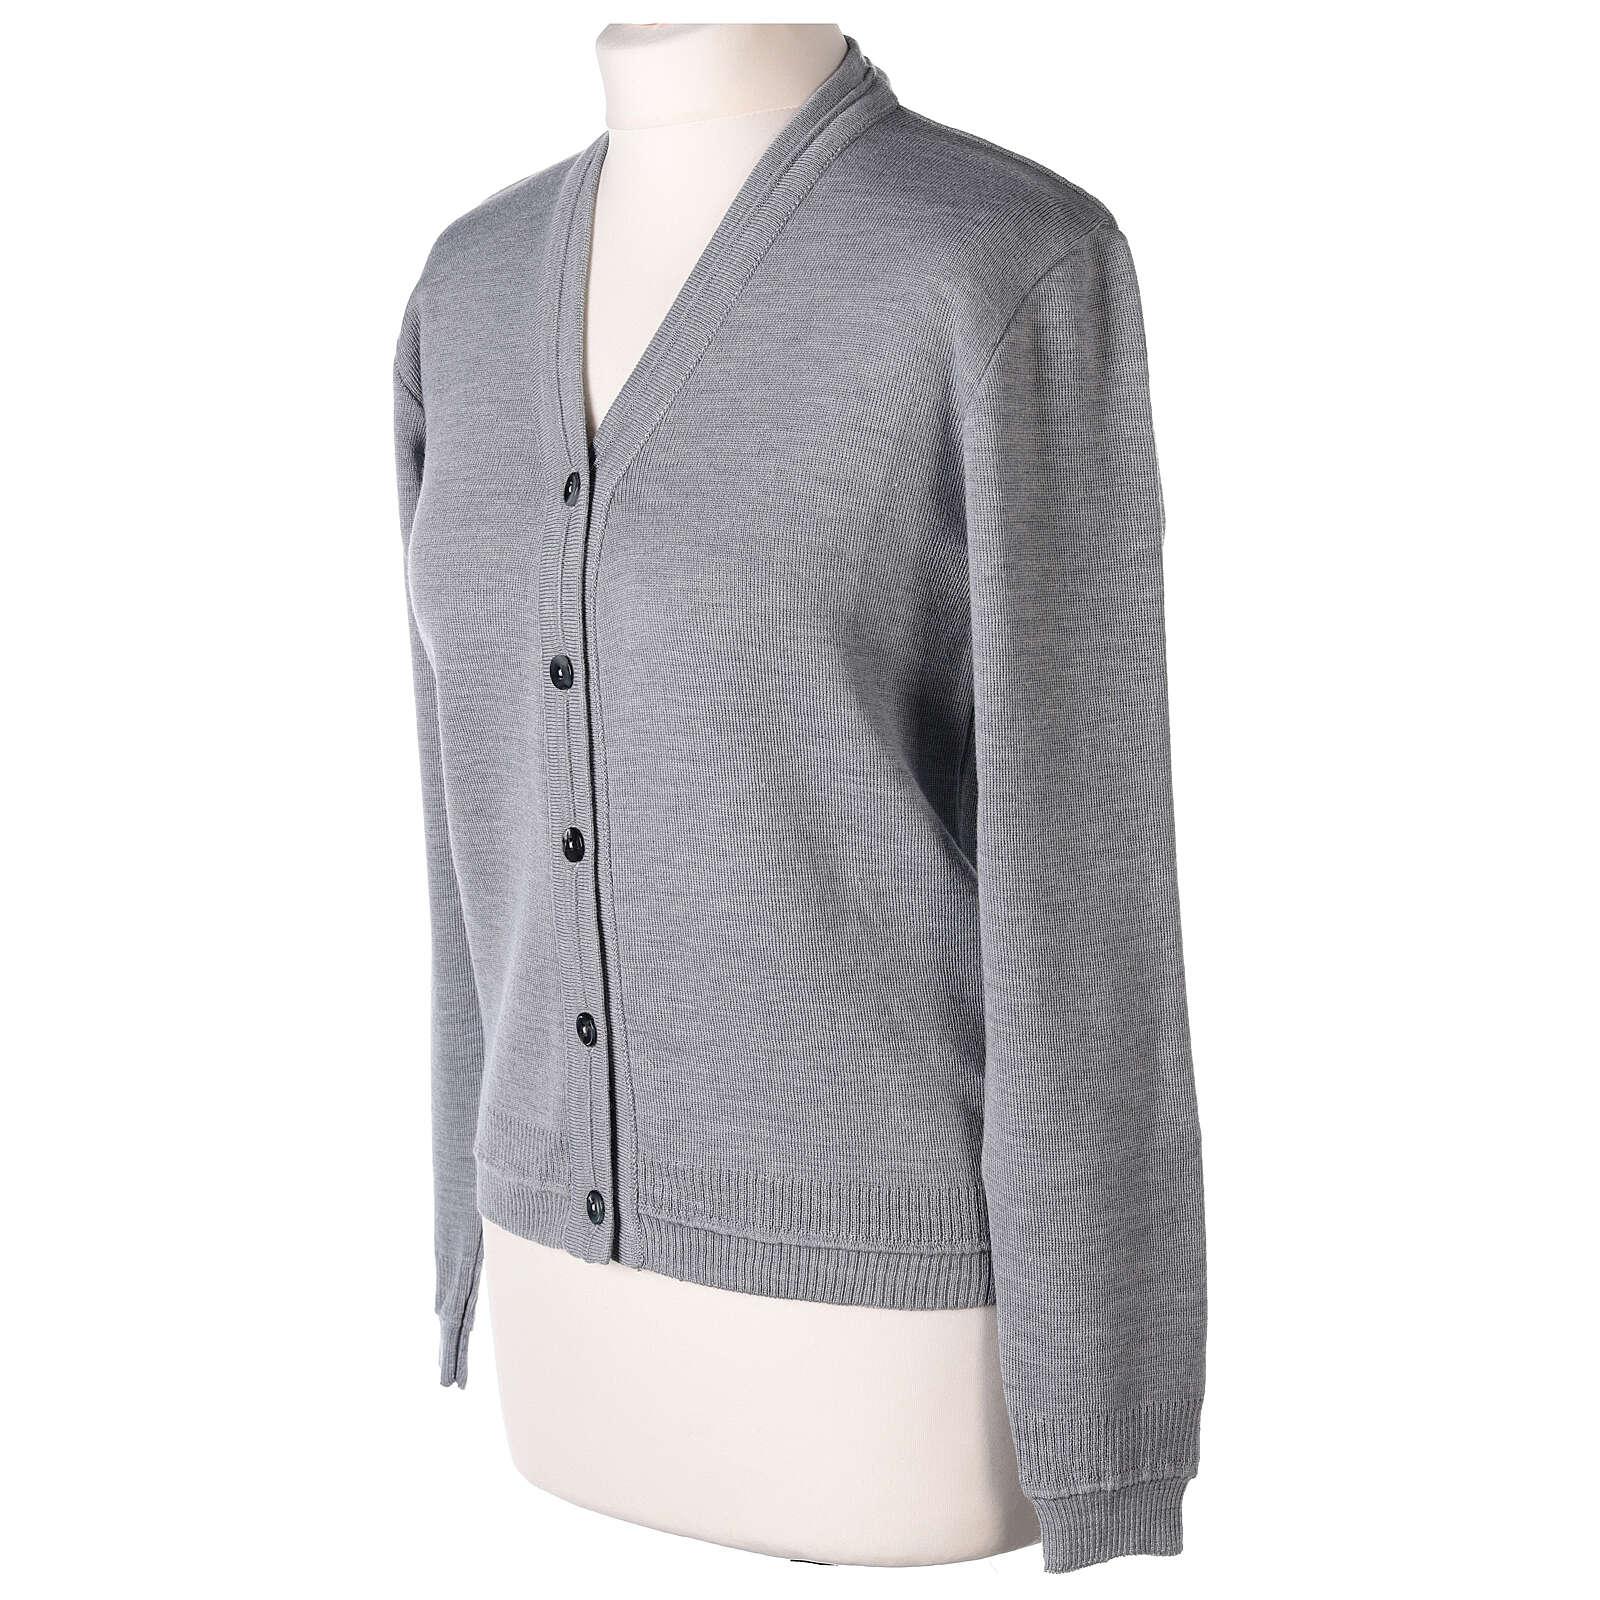 Cardigan court gris perle 50% laine mérinos 50% acrylique soeur In Primis 4